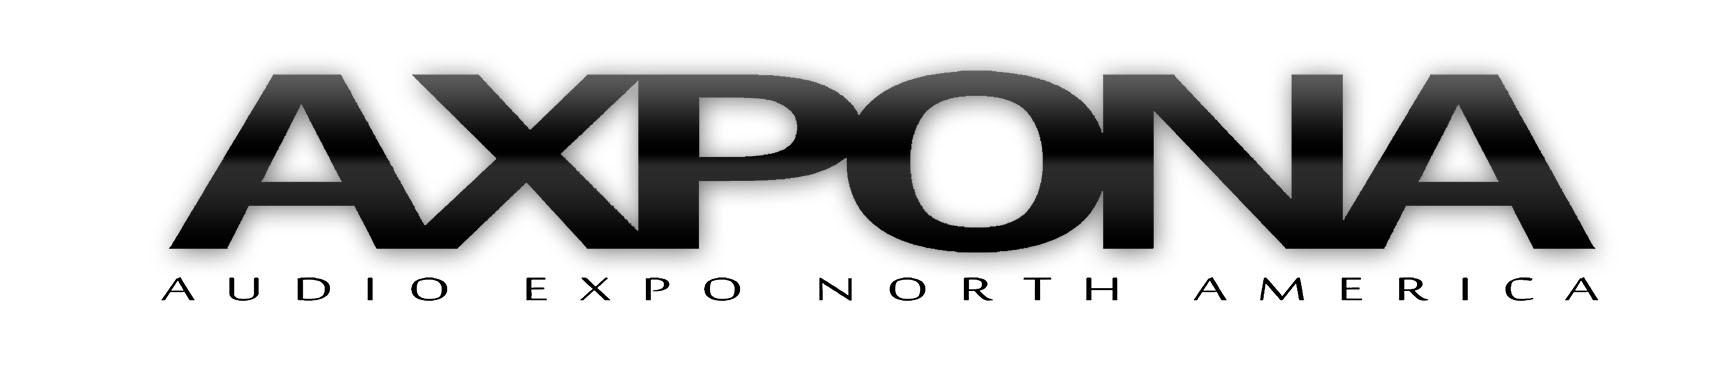 Axpona_logo_2013_whitebackground